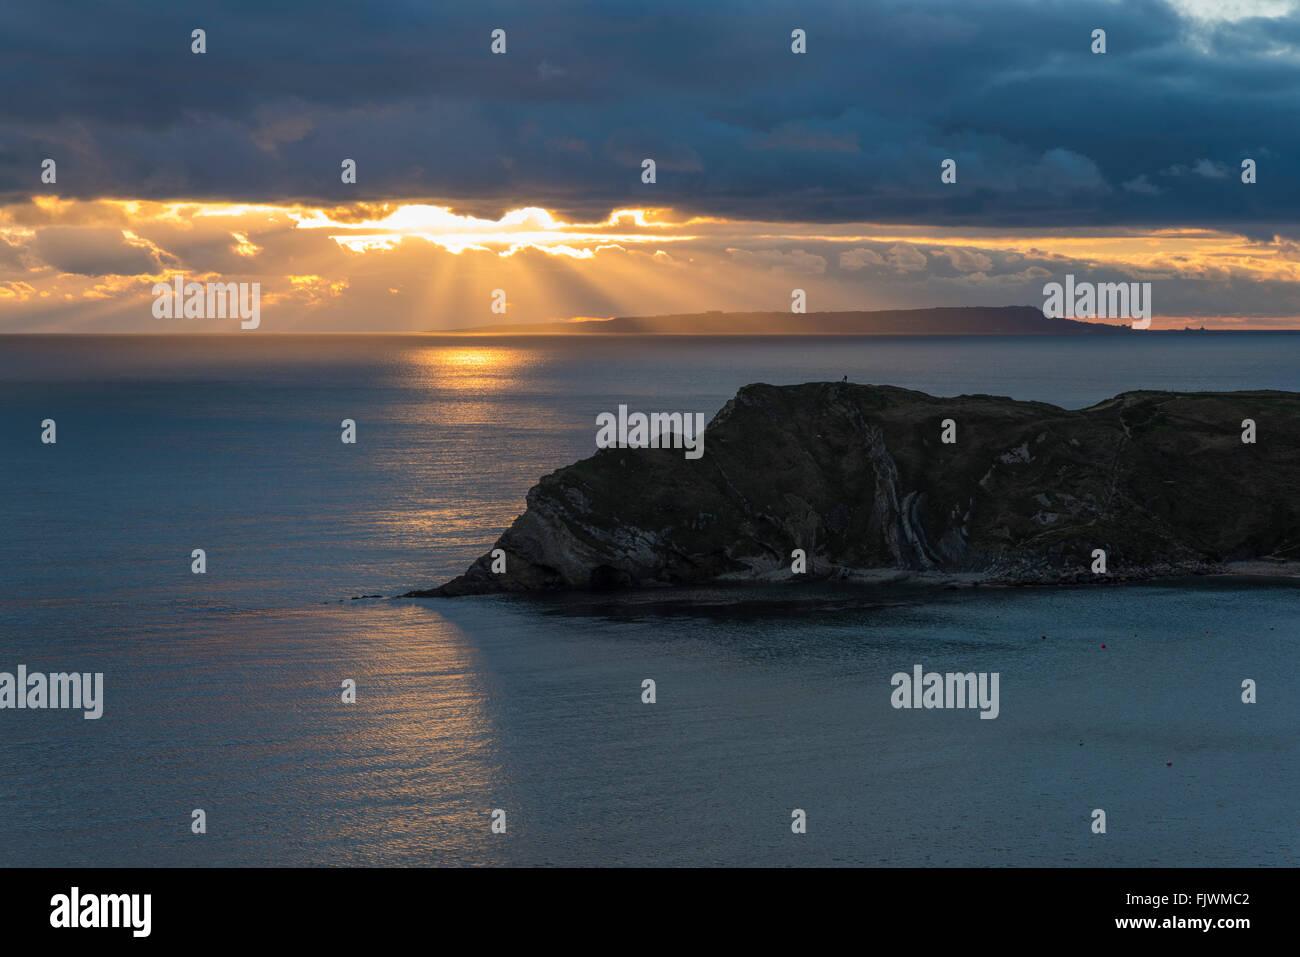 Sun beams shining through the cloud viewed from Lulworth Cove on Dorset's Jurassic Coast, UK - Stock Image